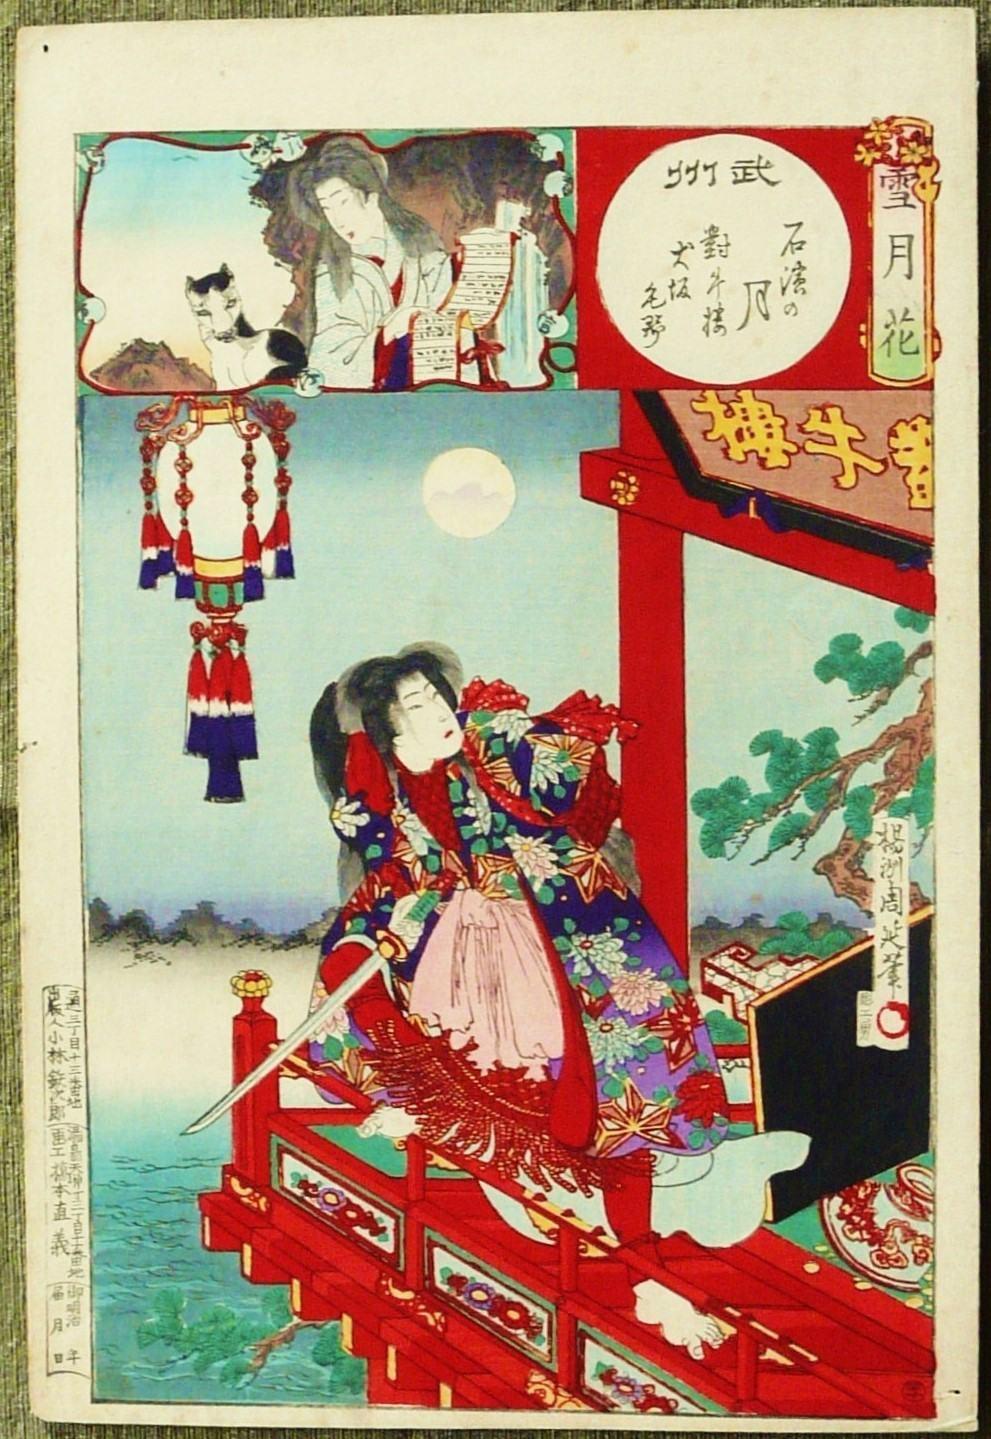 HASHIMOTO CHIKANOBU: #P4326 BUSHU, MOON AT ISHIHAMA (1884-1886)